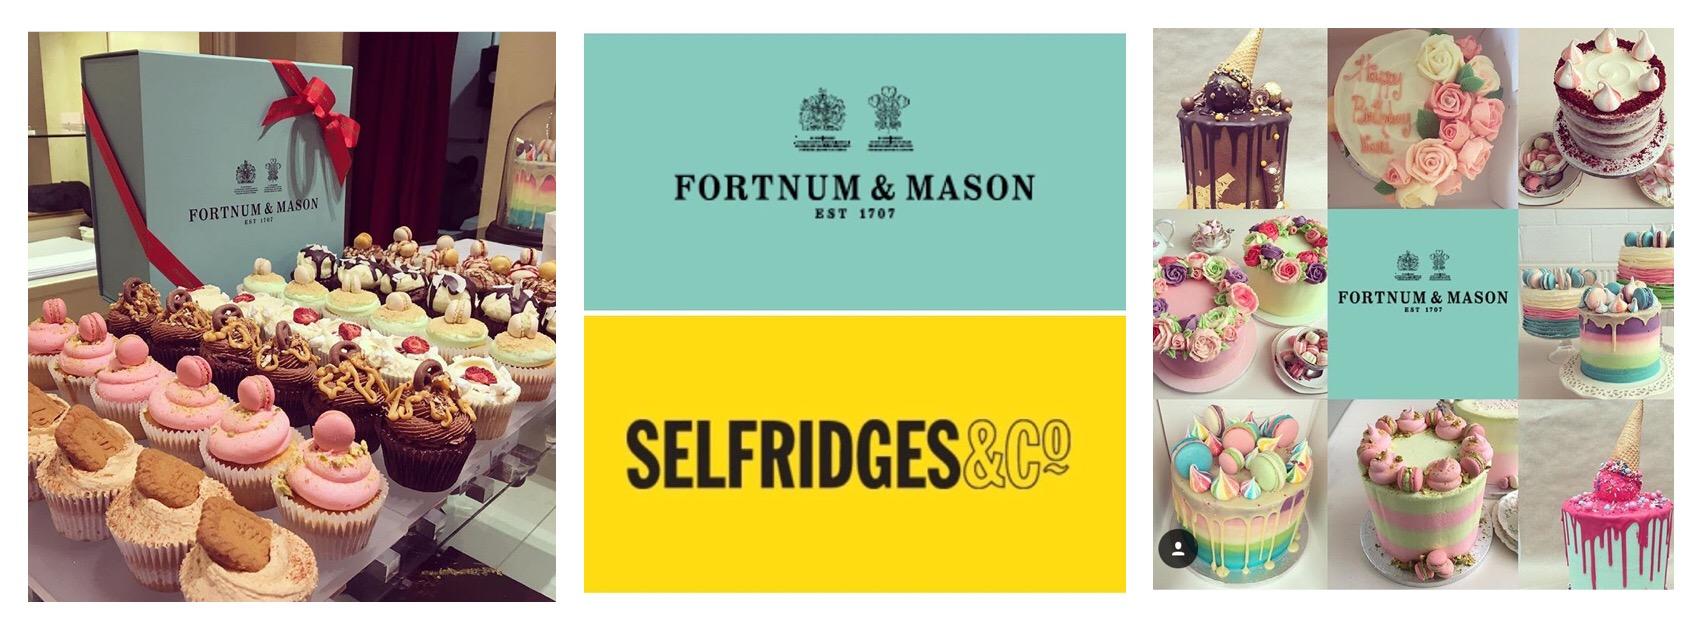 Cupcakes London Crumbs Couture - Selfridges Wedding Cakes